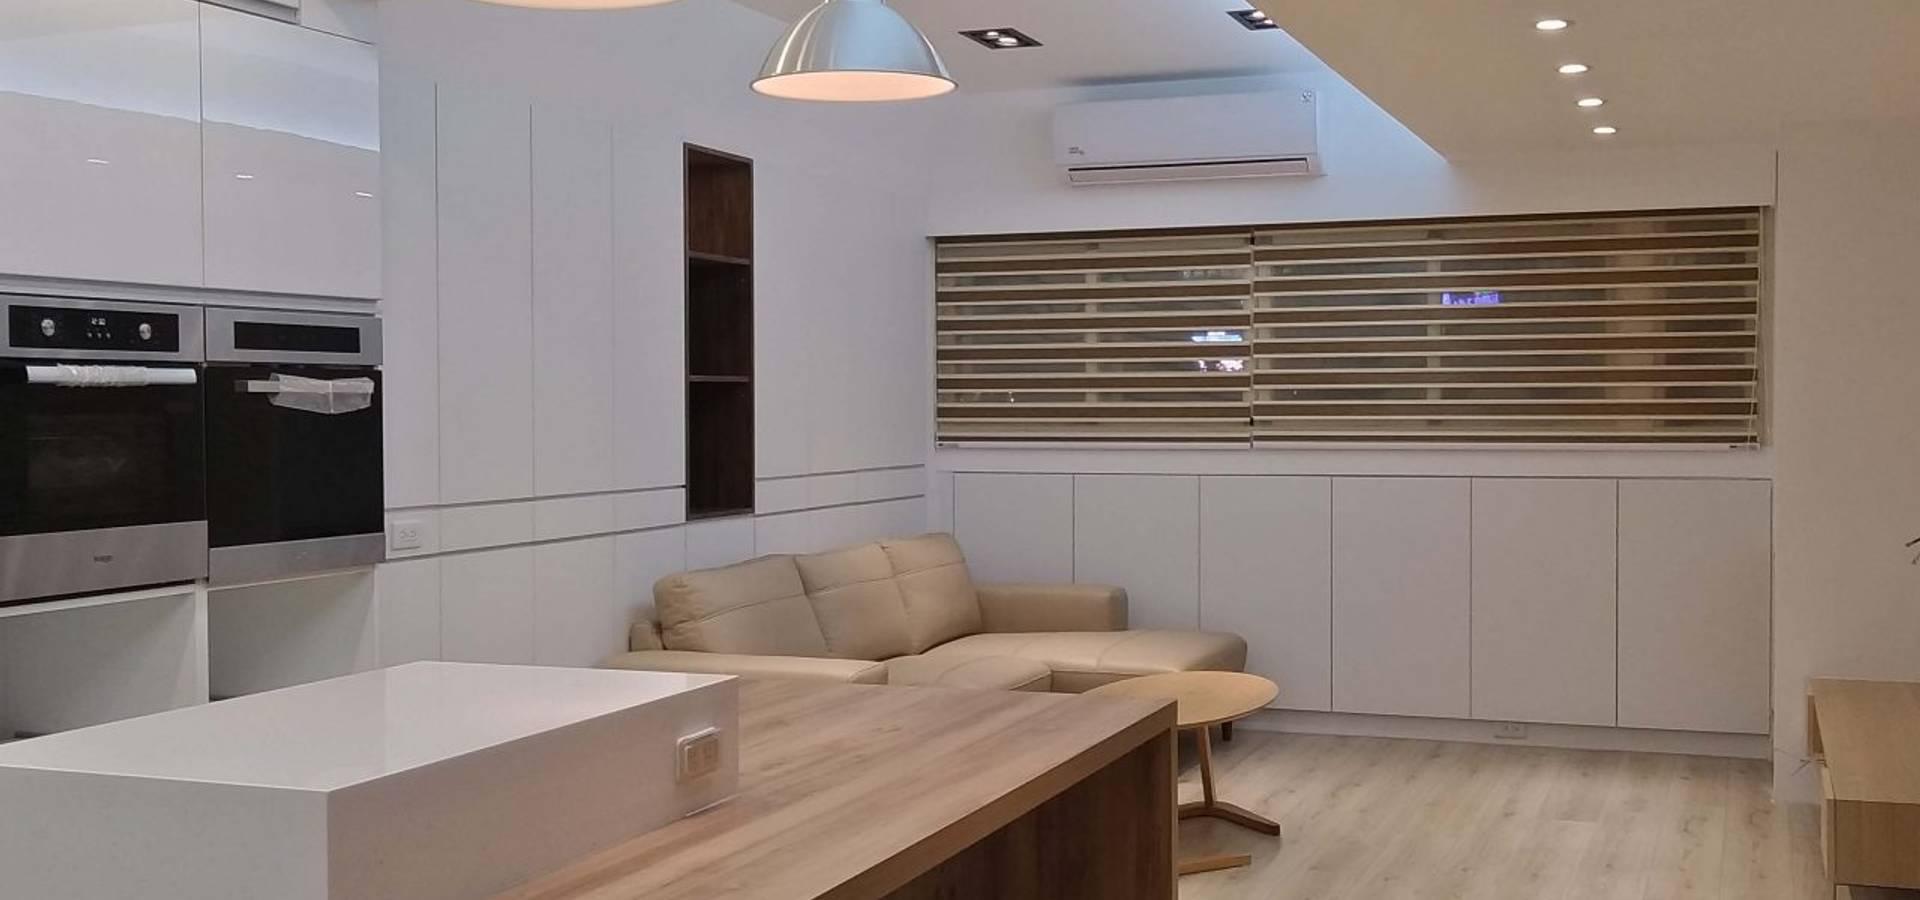 ADC室內設計